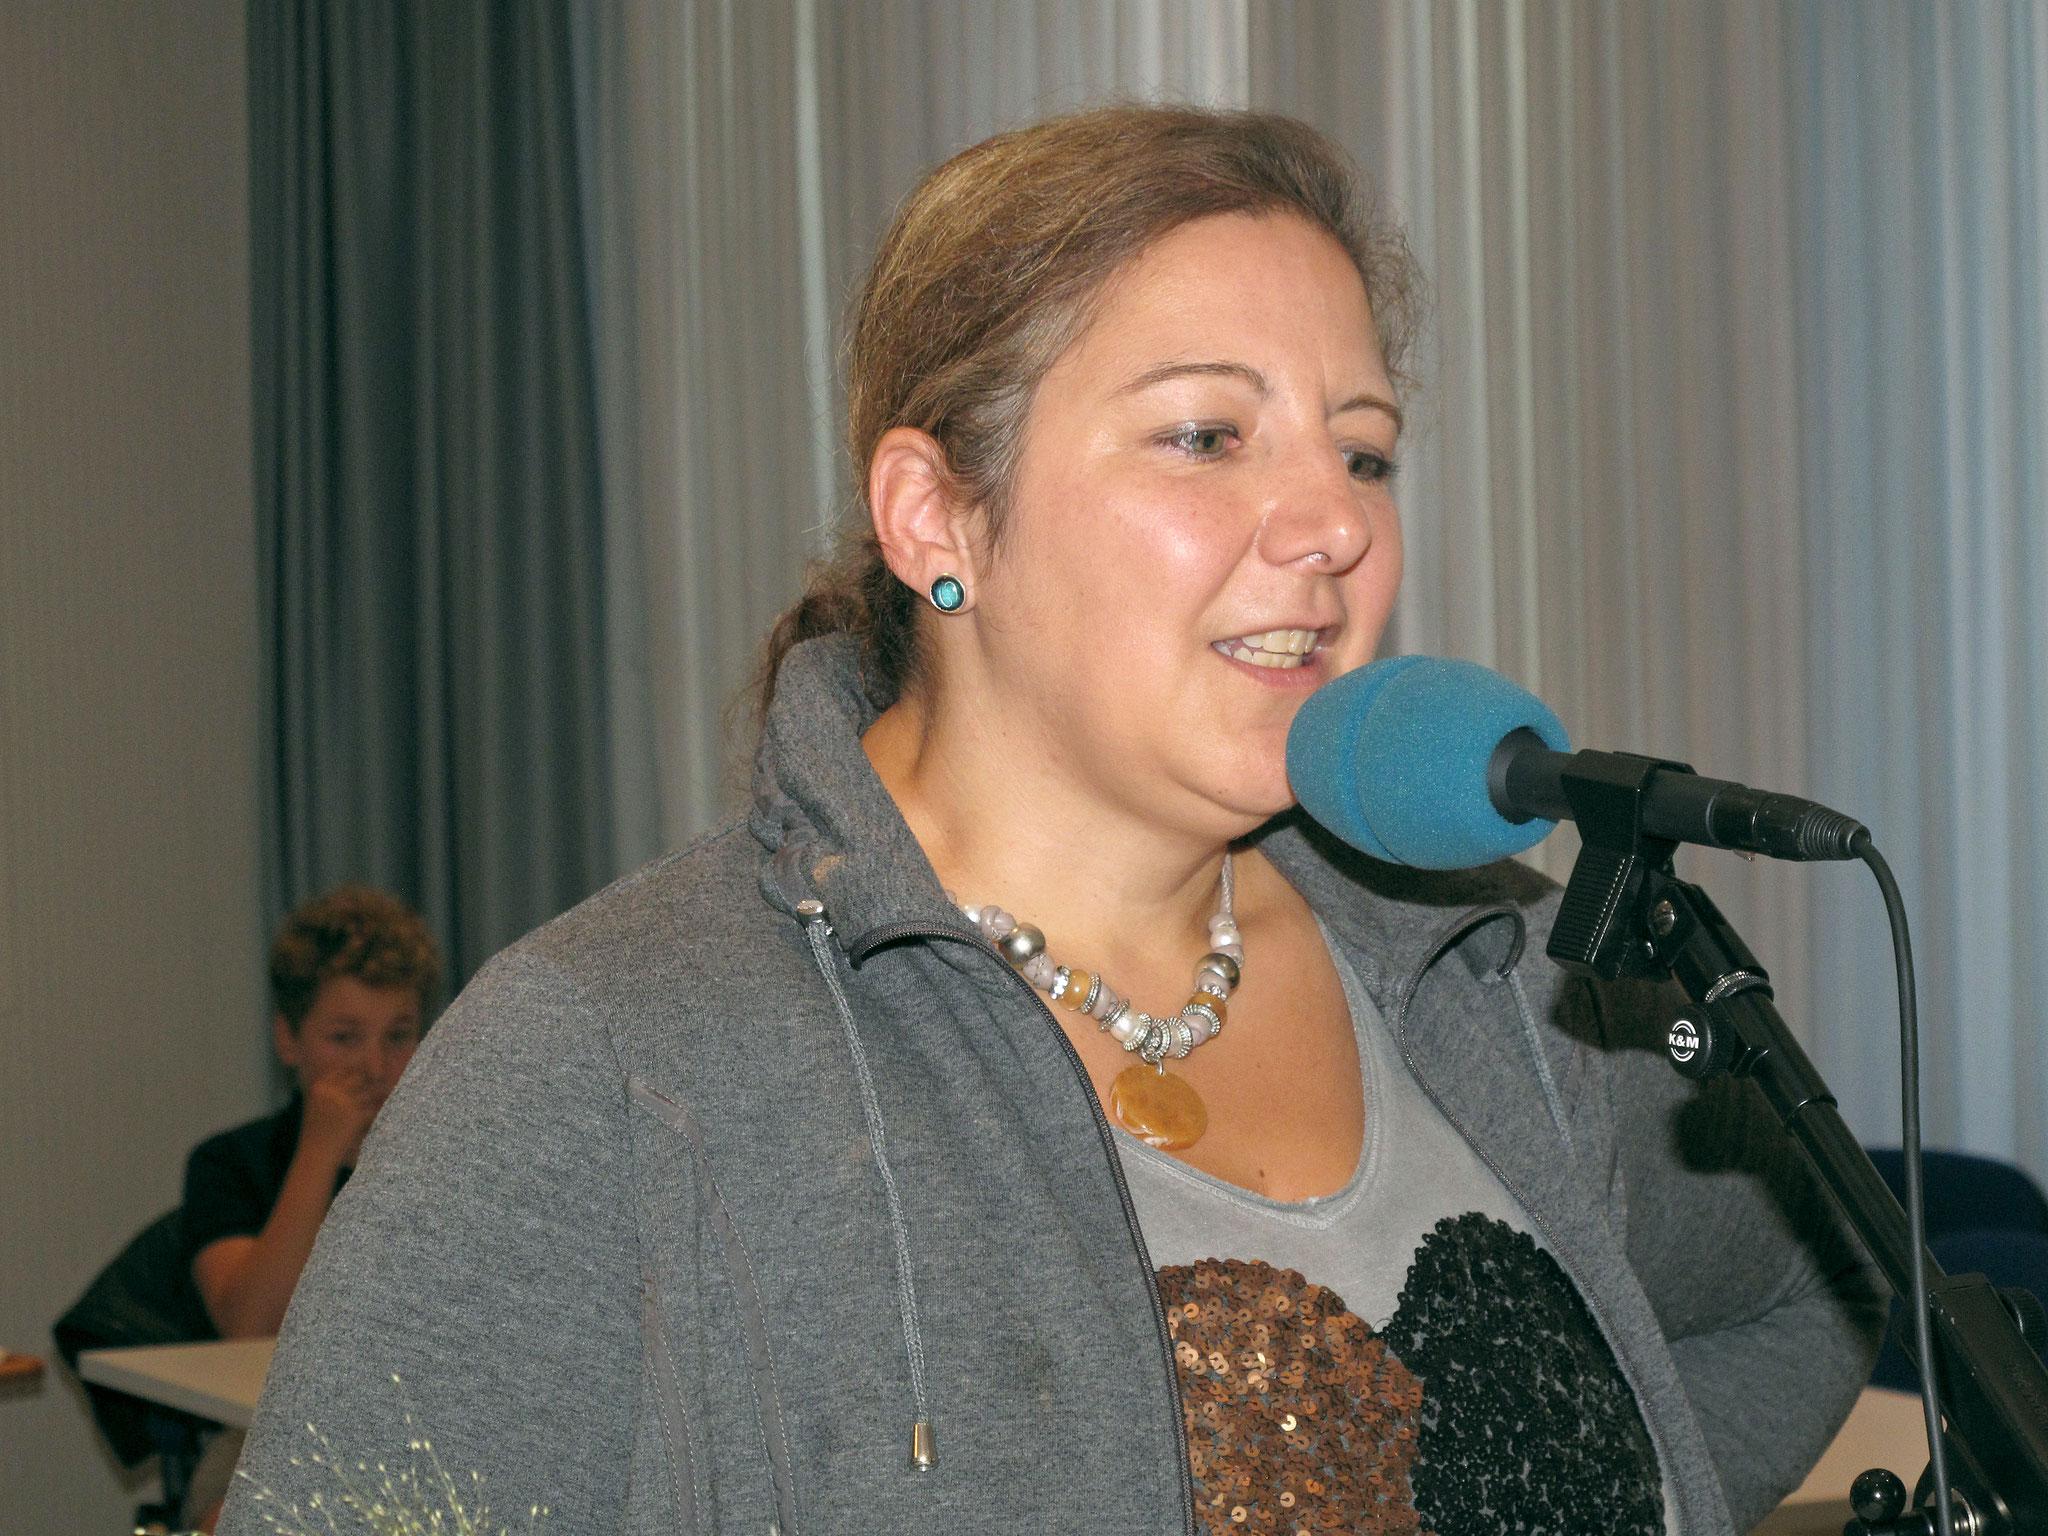 Alexandra Segmüller